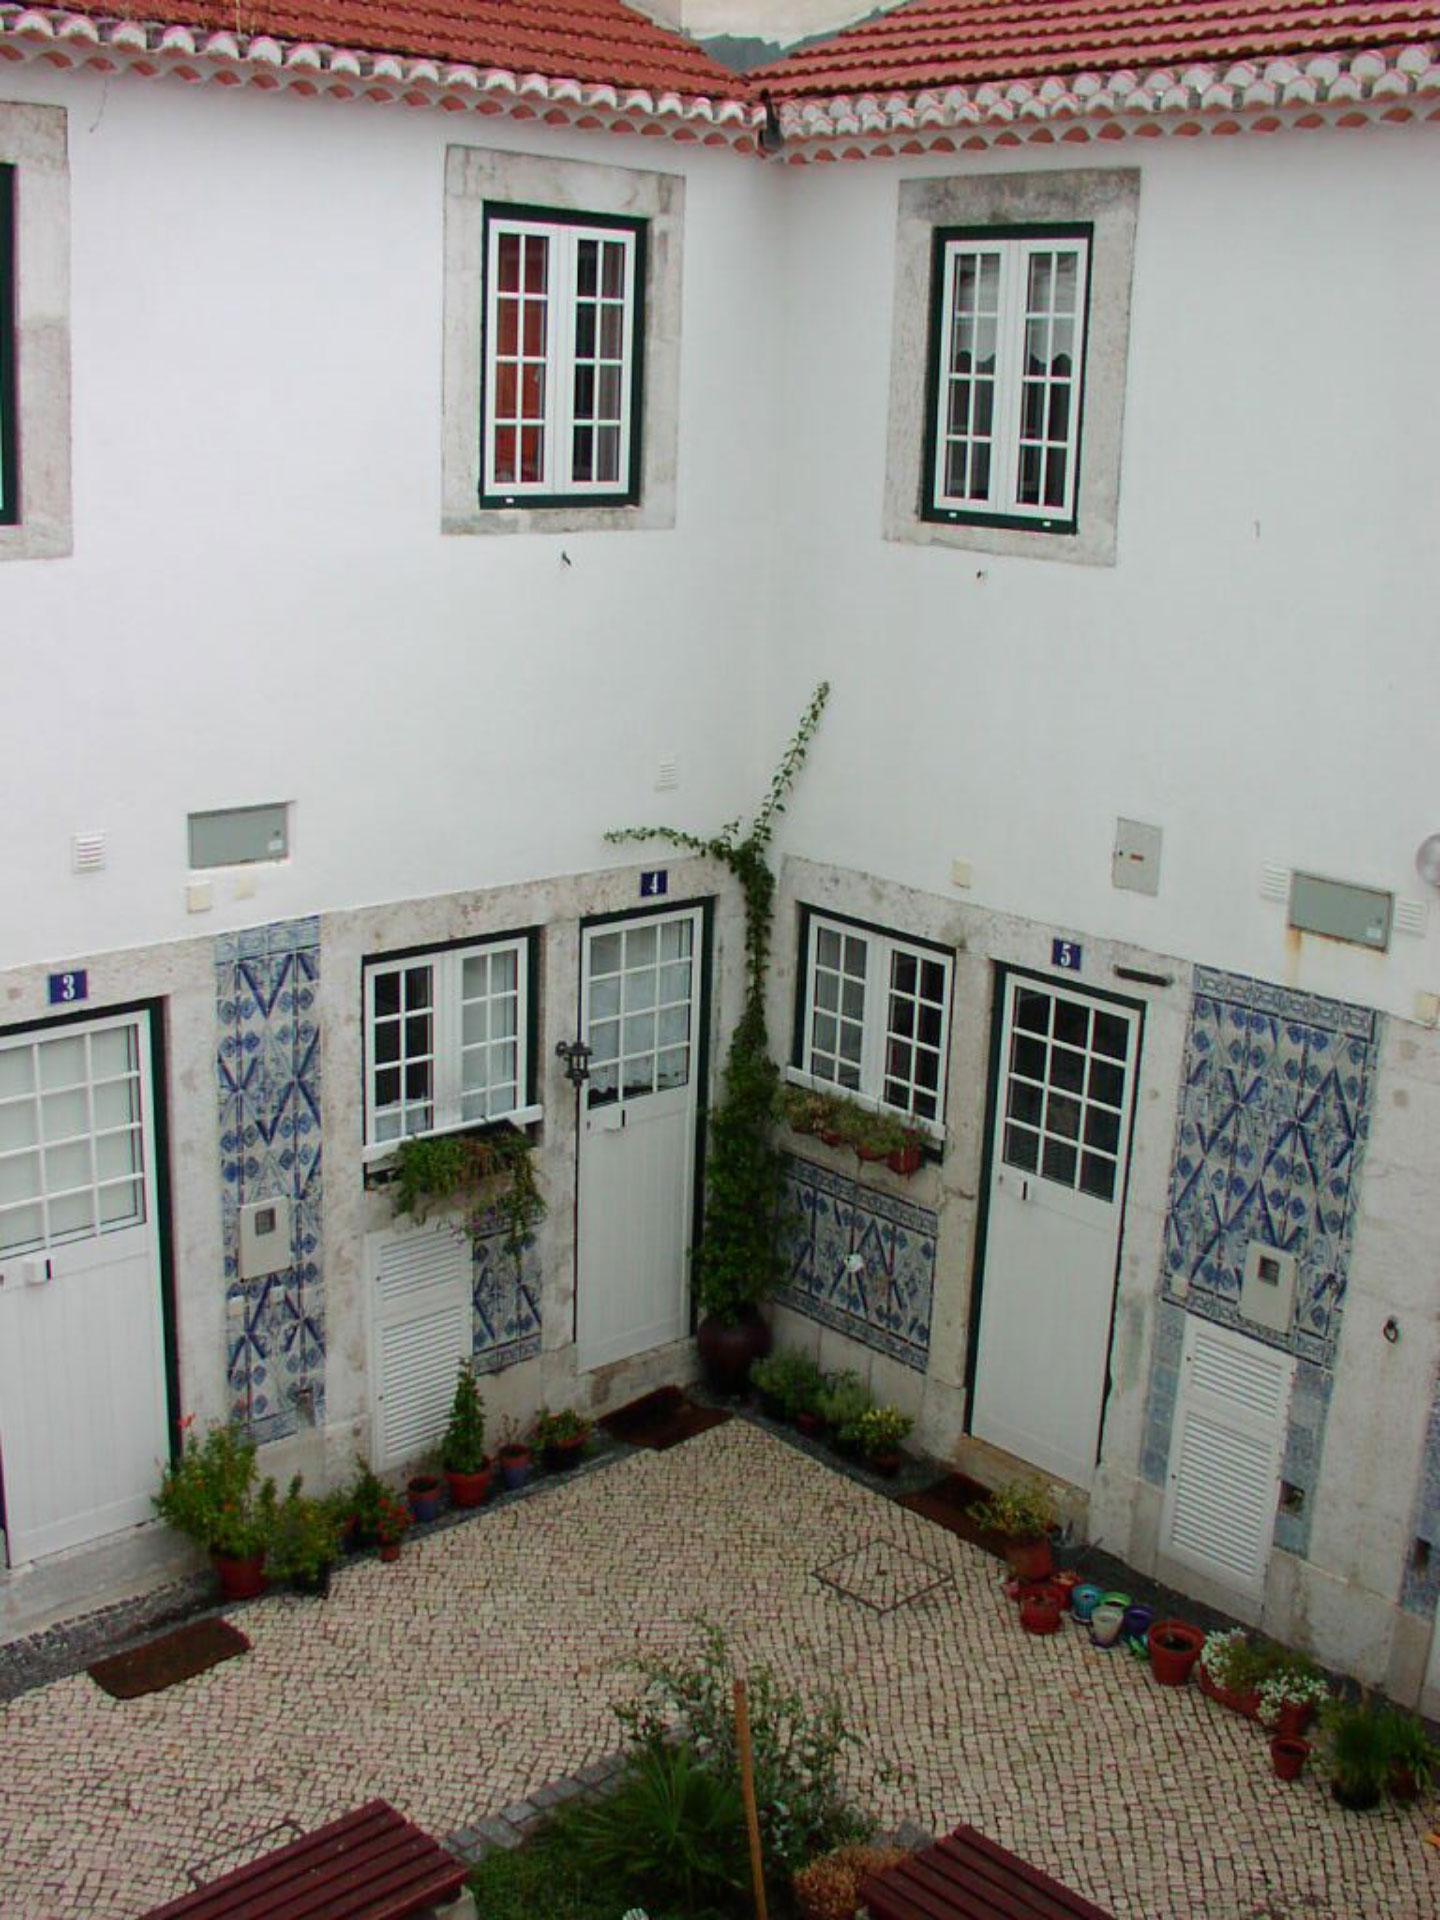 palacio vila flor lissabon